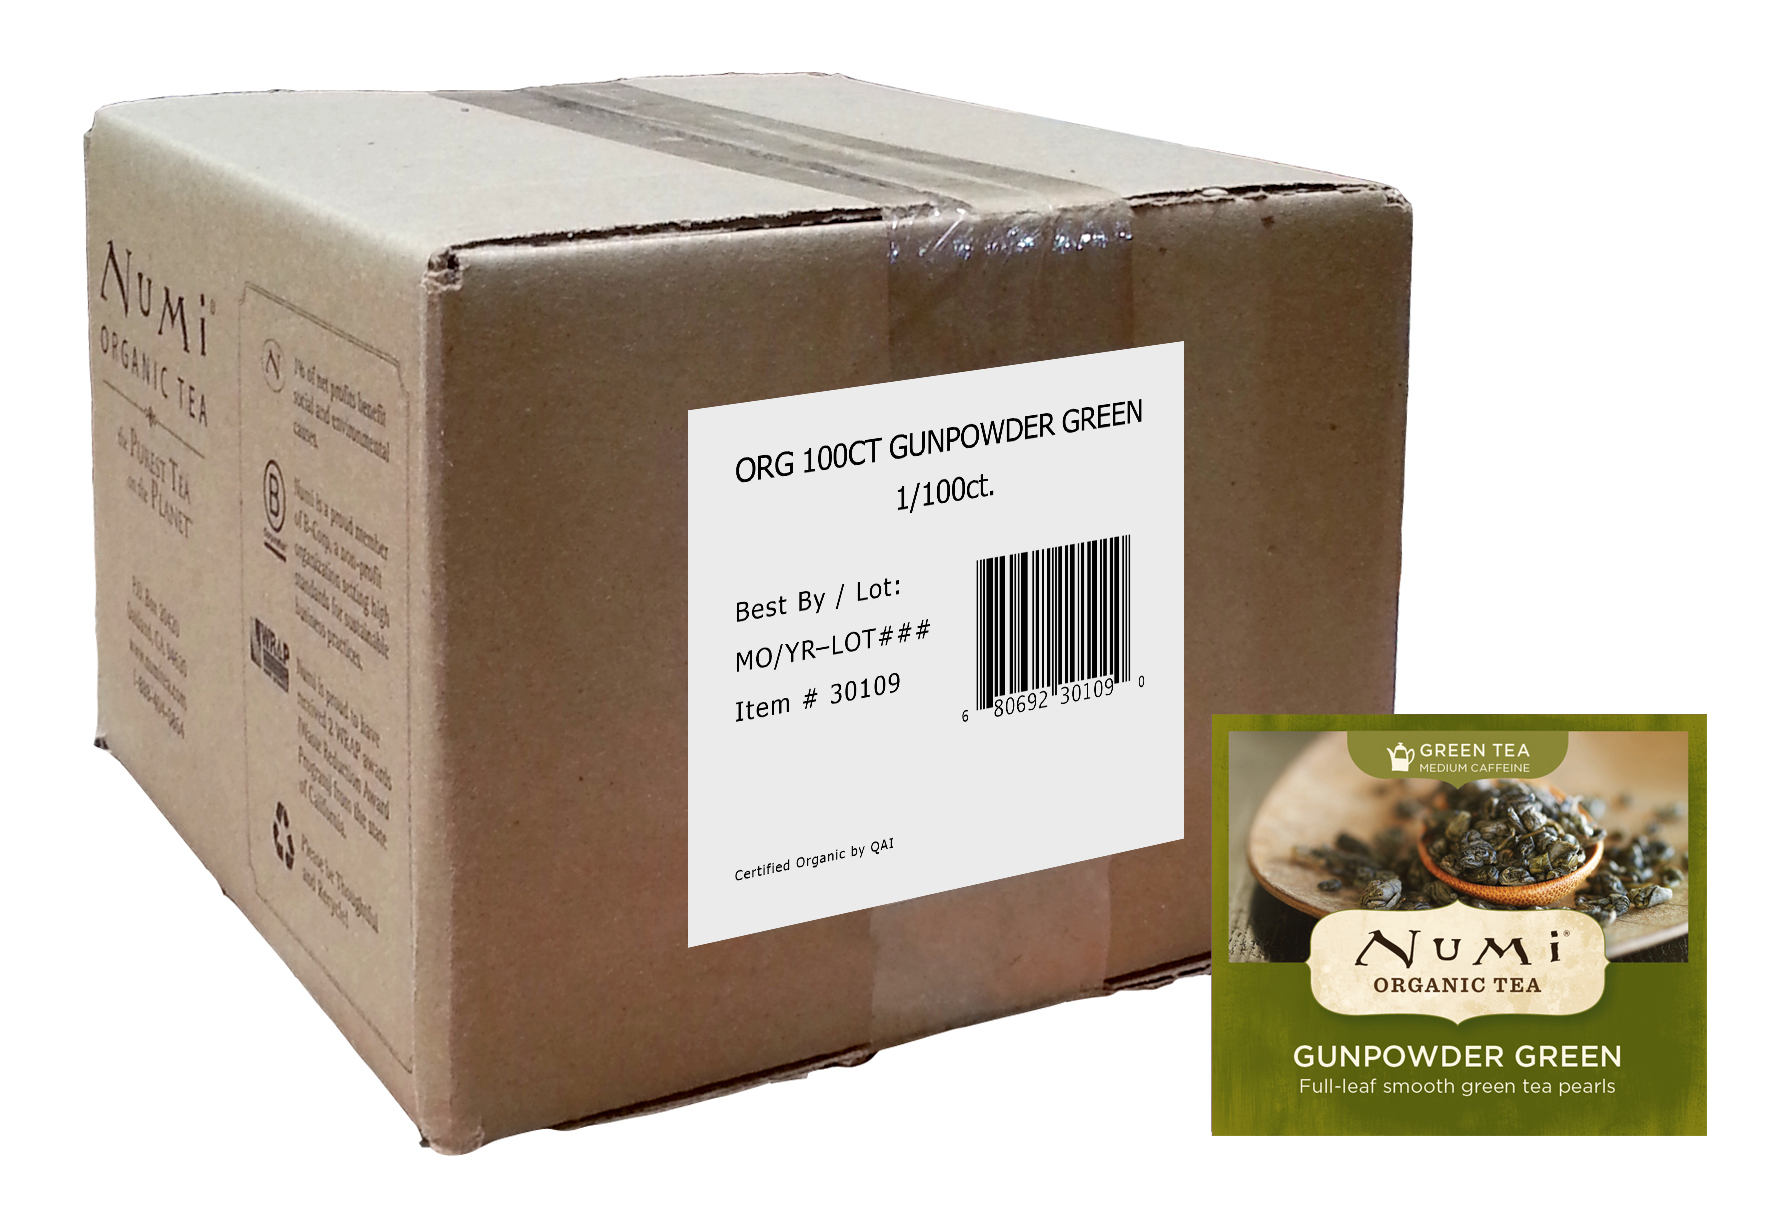 Numi Organic Gunpowder Green 100 ct